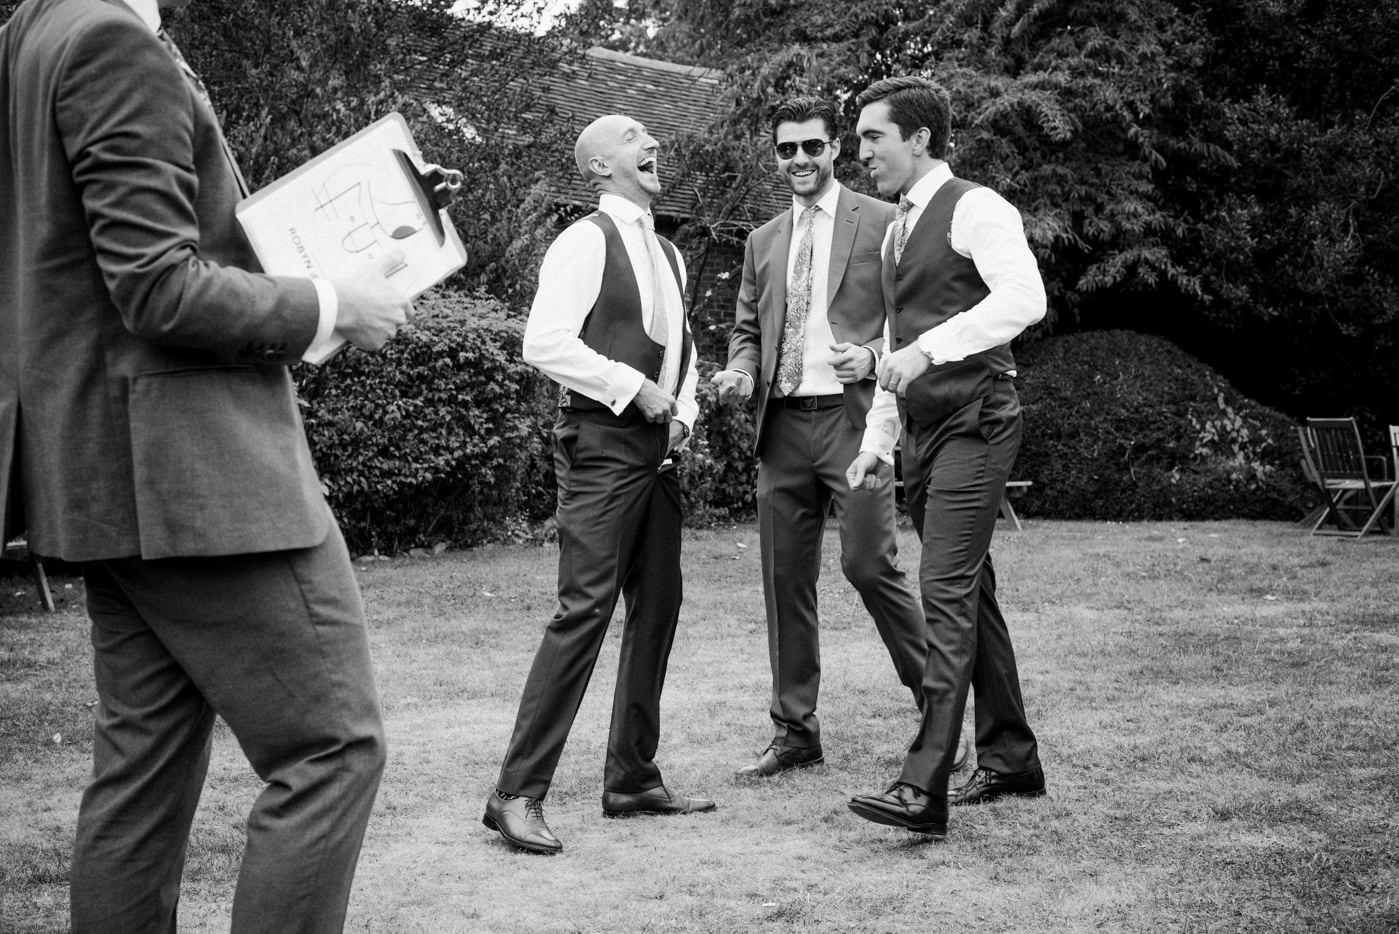 bignor-park-wedding-photography-robyn-and-tom-29